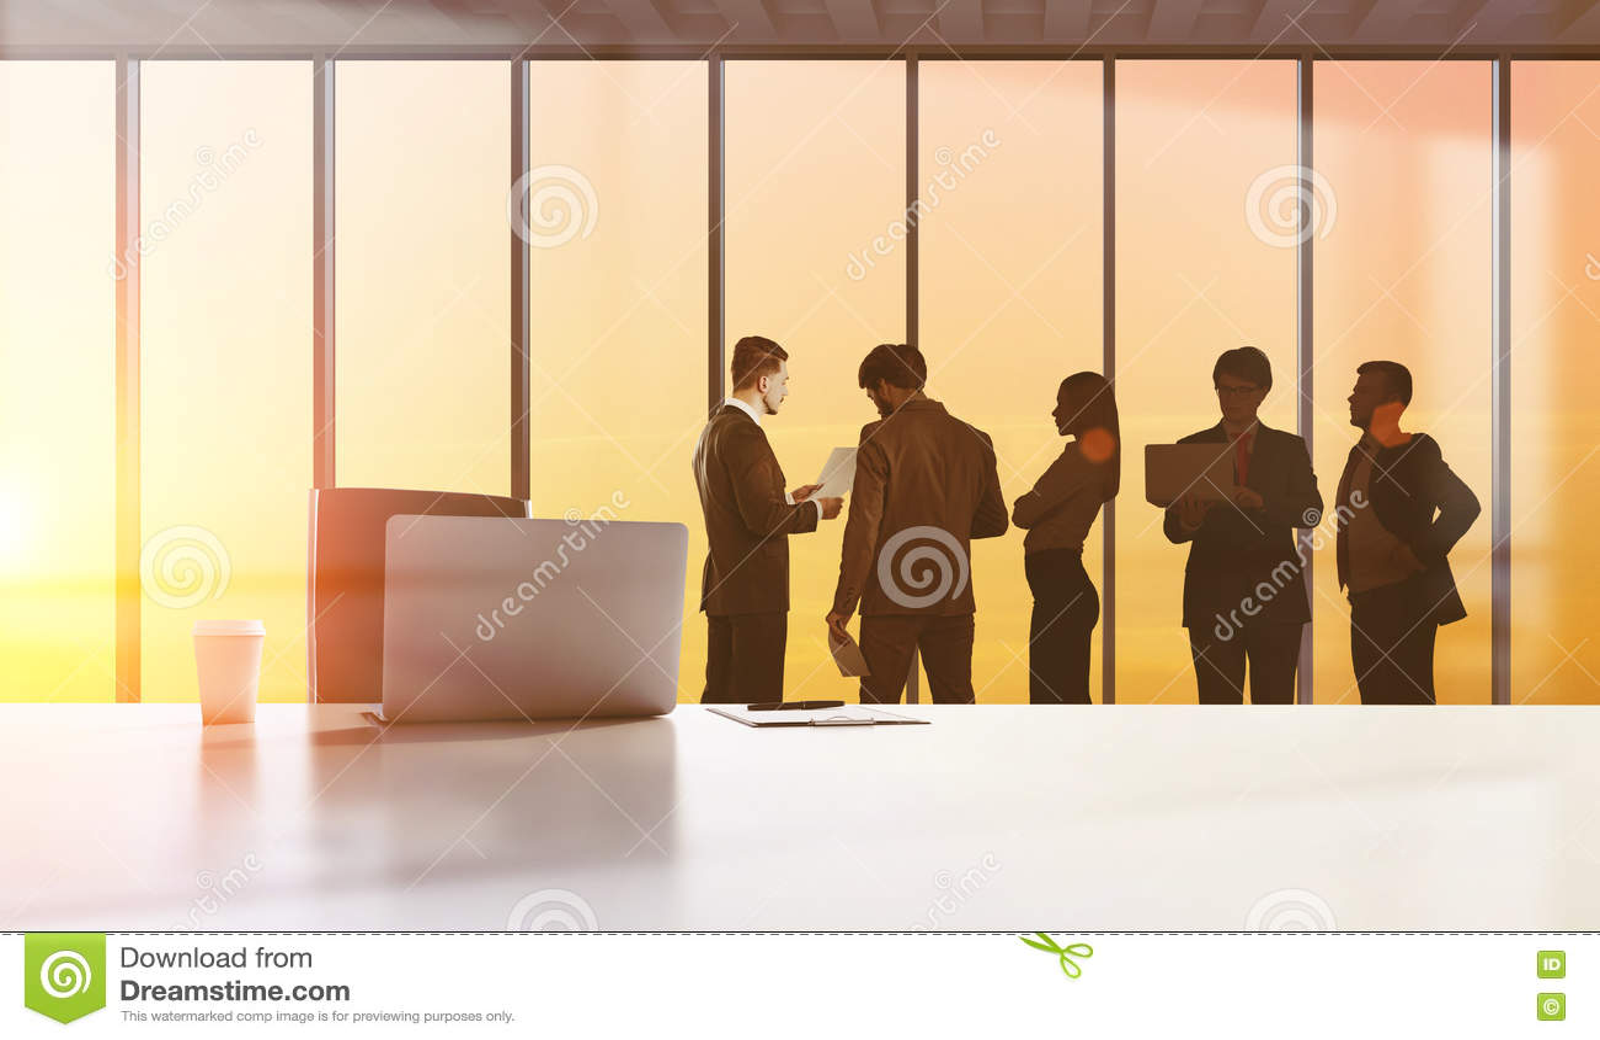 Businesspeople figures, teamwork concept